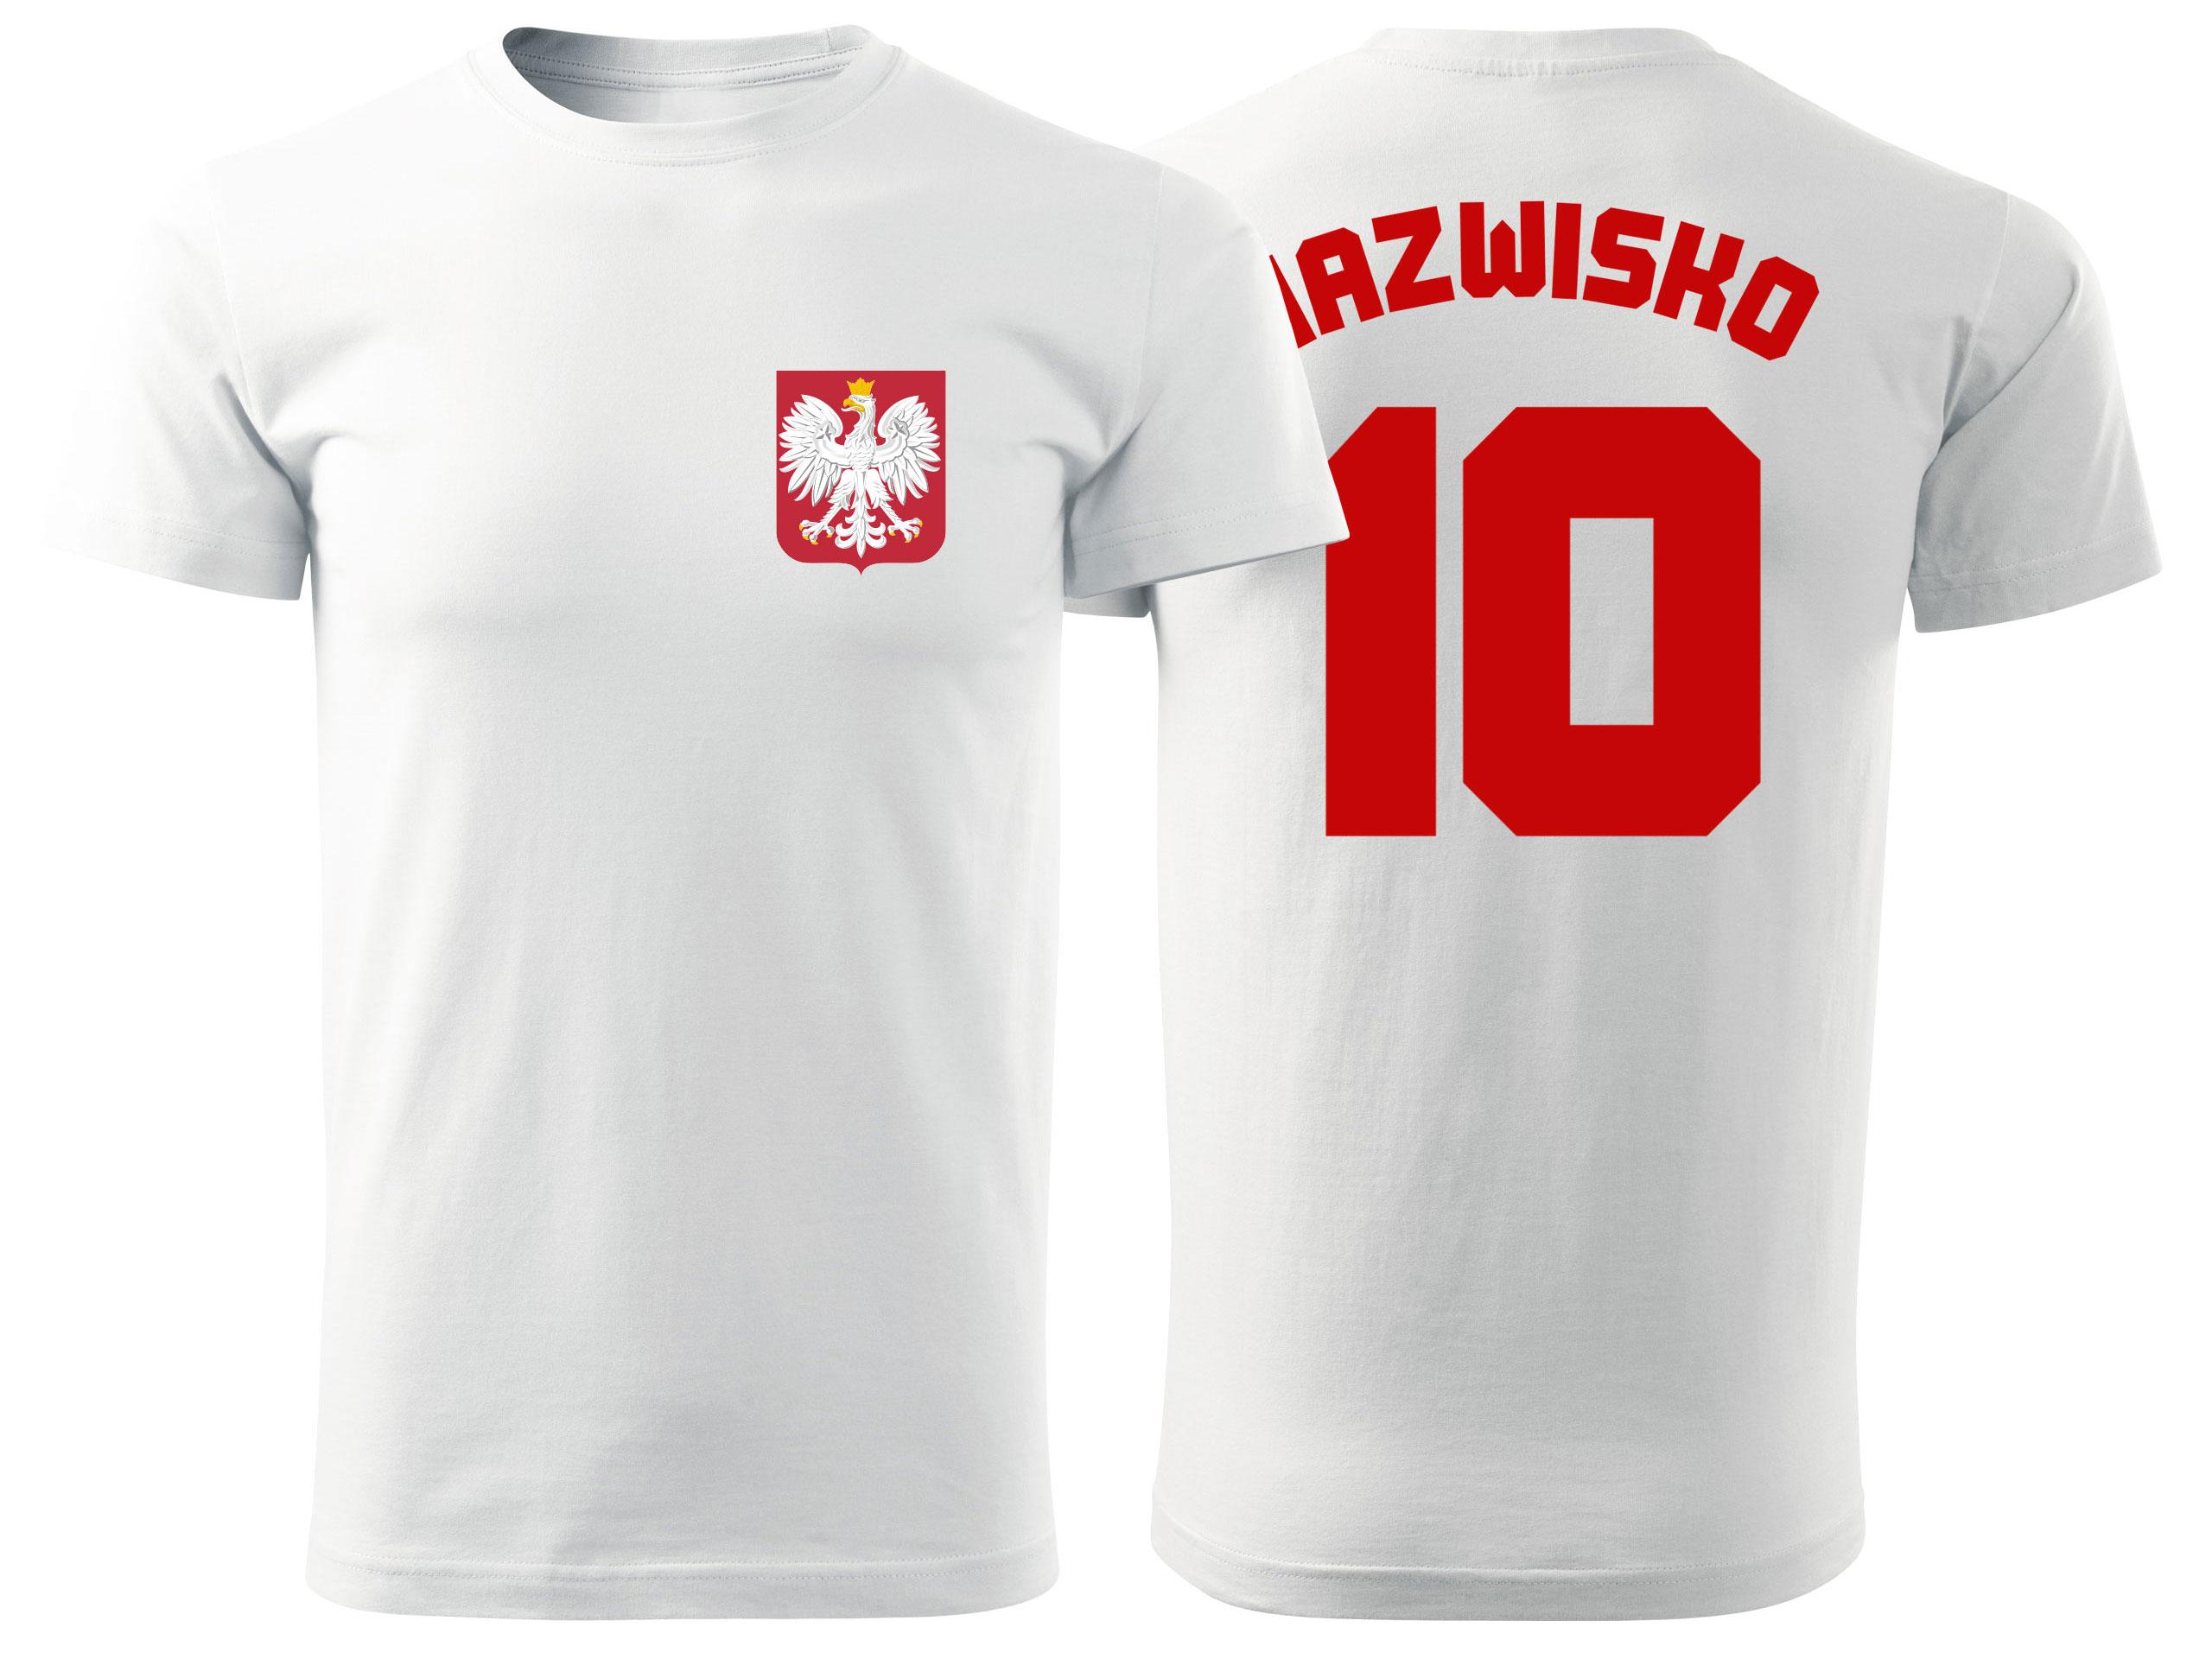 Tričko vaše košele Tlač Poľsko XL!